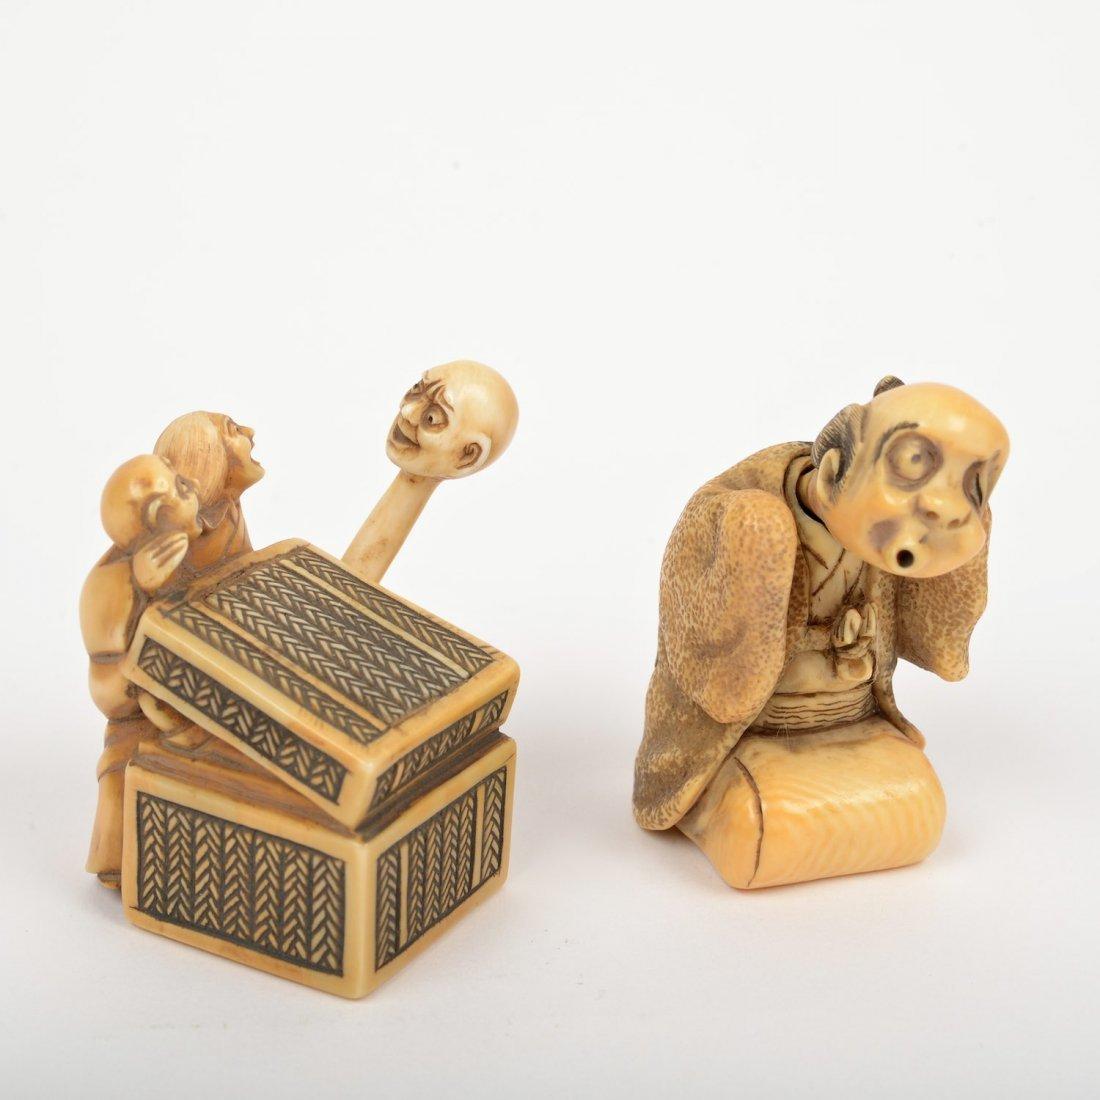 (2) Japanese ivory artist-signed karakuri netsuke